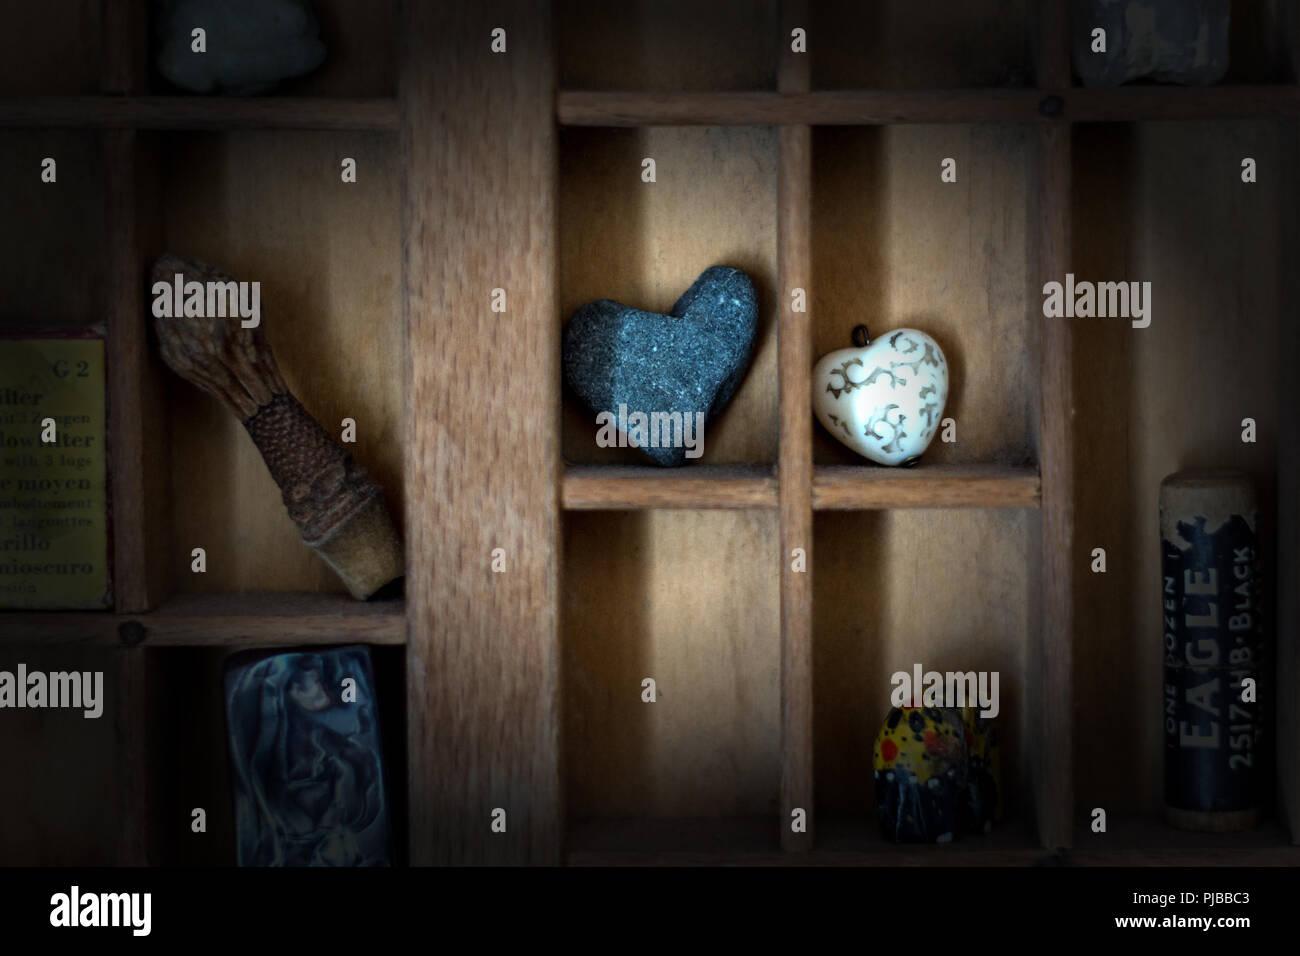 Small Knick Knacks On Wooden Shelves Stock Photo 217838659 Alamy